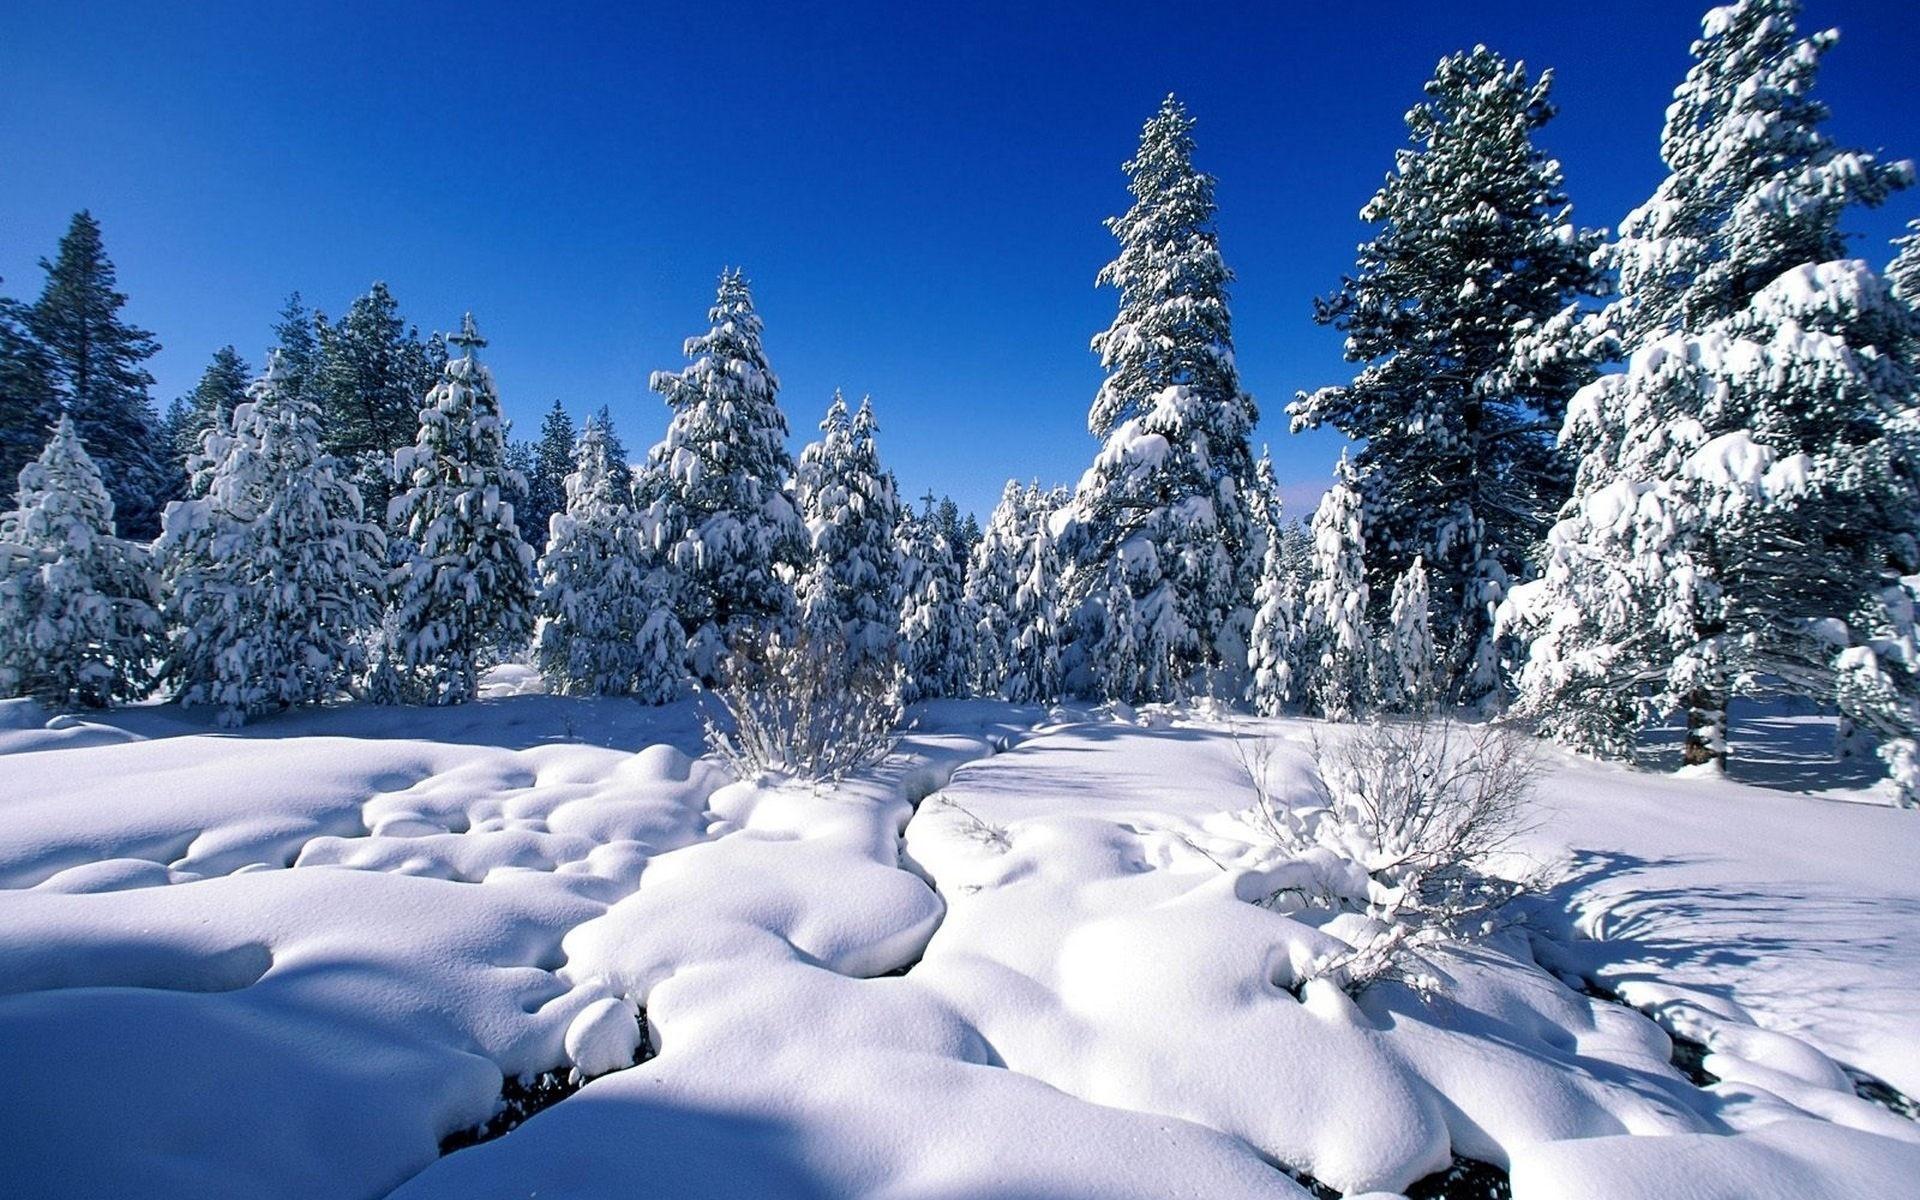 про зиму с картинками магазине примадонна представлен